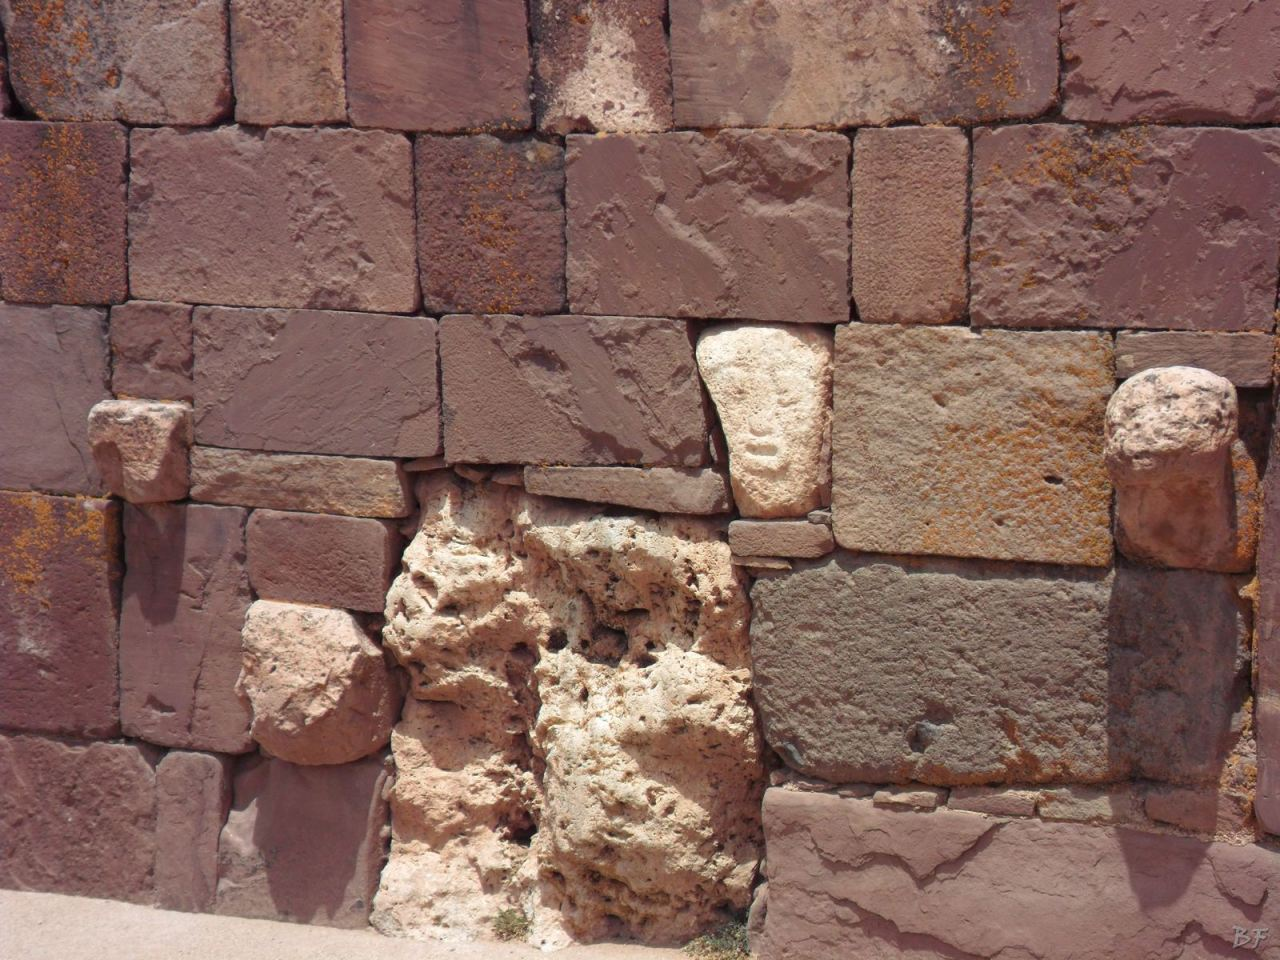 Sito-Megalitico-Piramide-Akapana-Kalasasaya-Menhir-Tiahuanaco-Bolivia-86